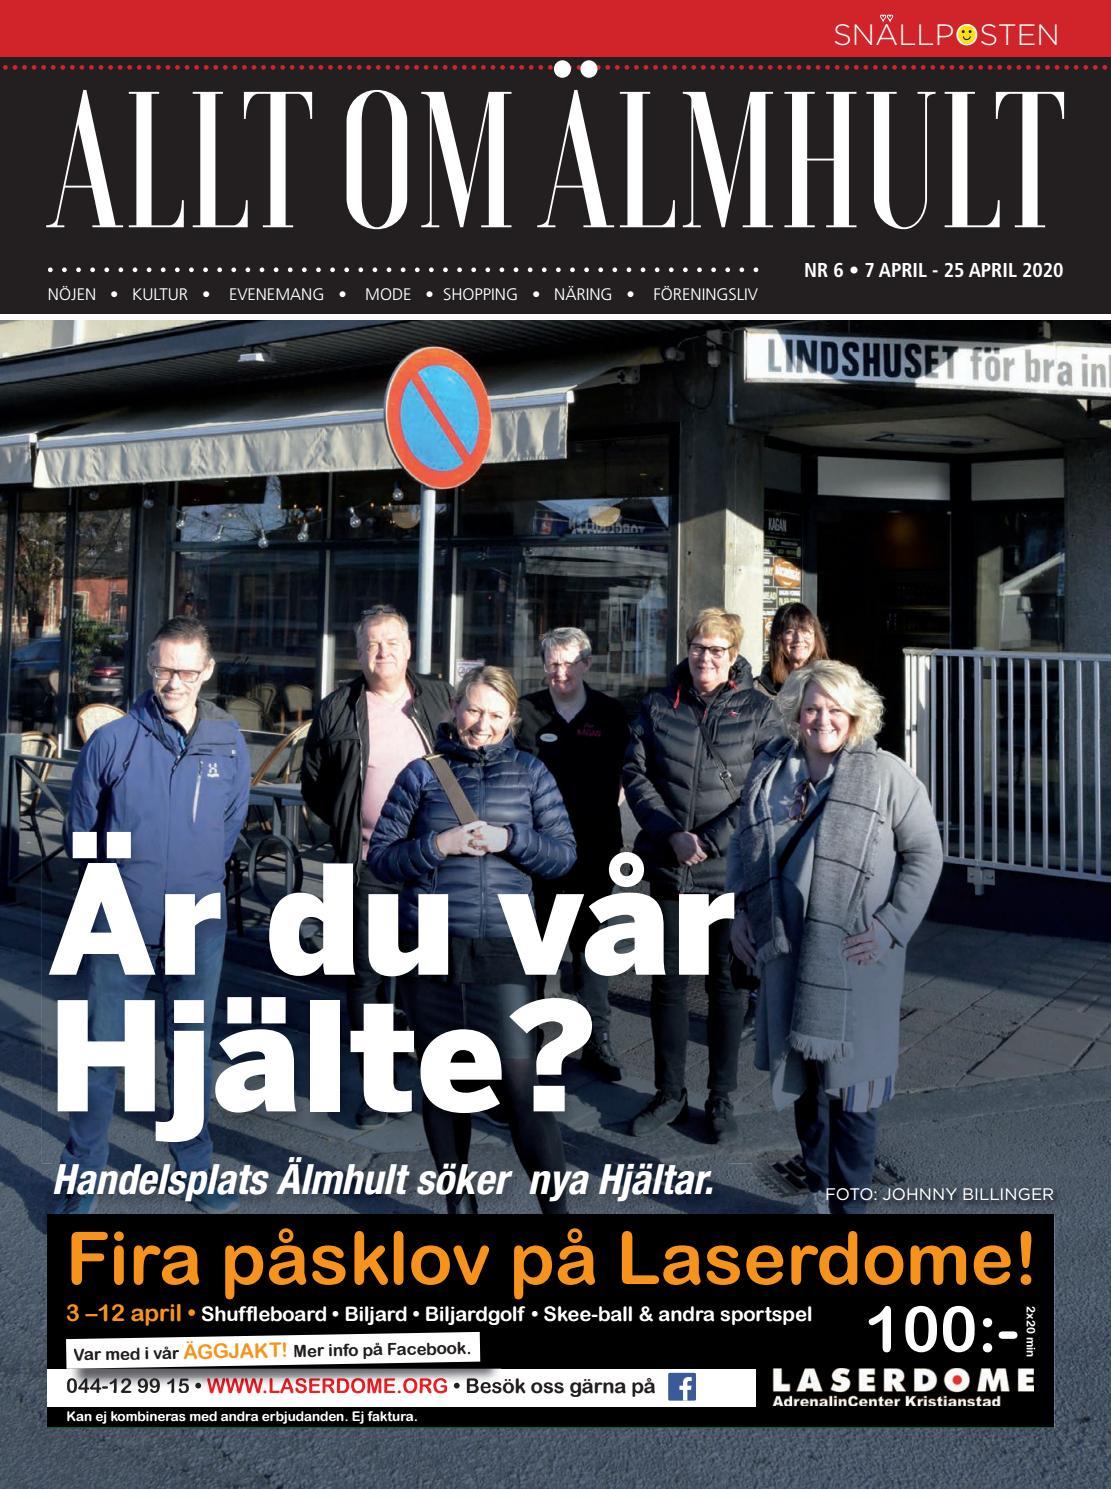 Kampradmiljoner till lmhults ldre - P4 Kronoberg | Sveriges